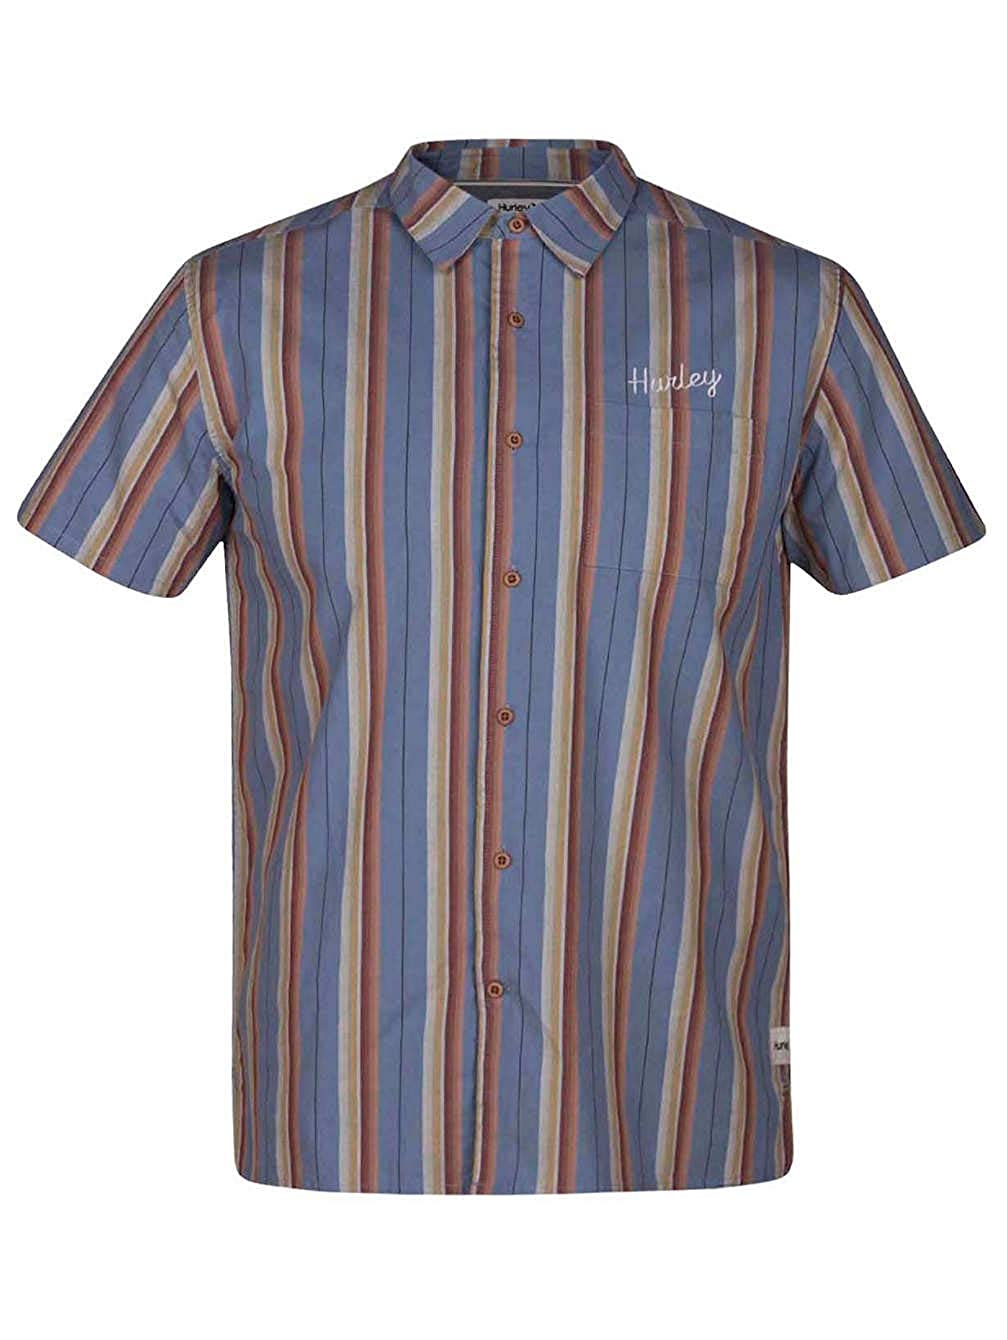 Hurley Mens AJ1856 Cape Town Short Sleeve Shirt